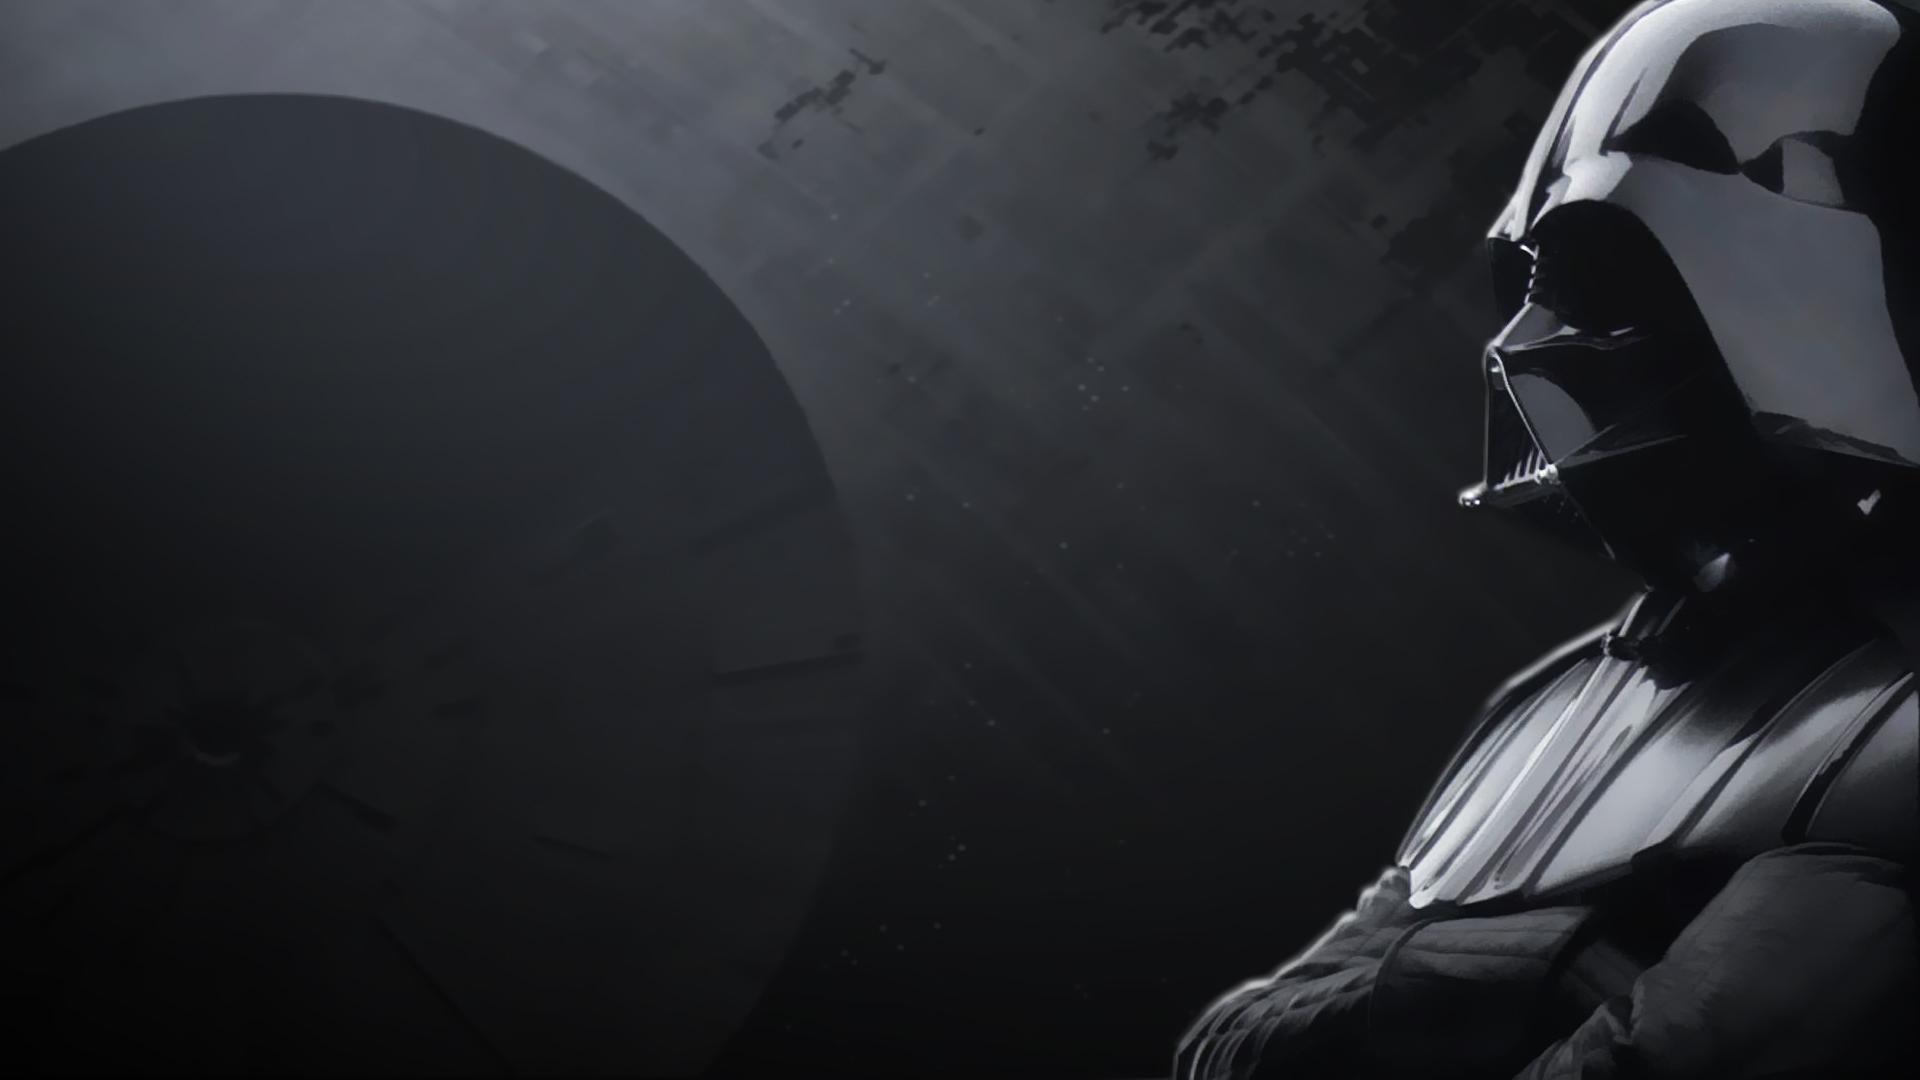 Death Star Background ·â'